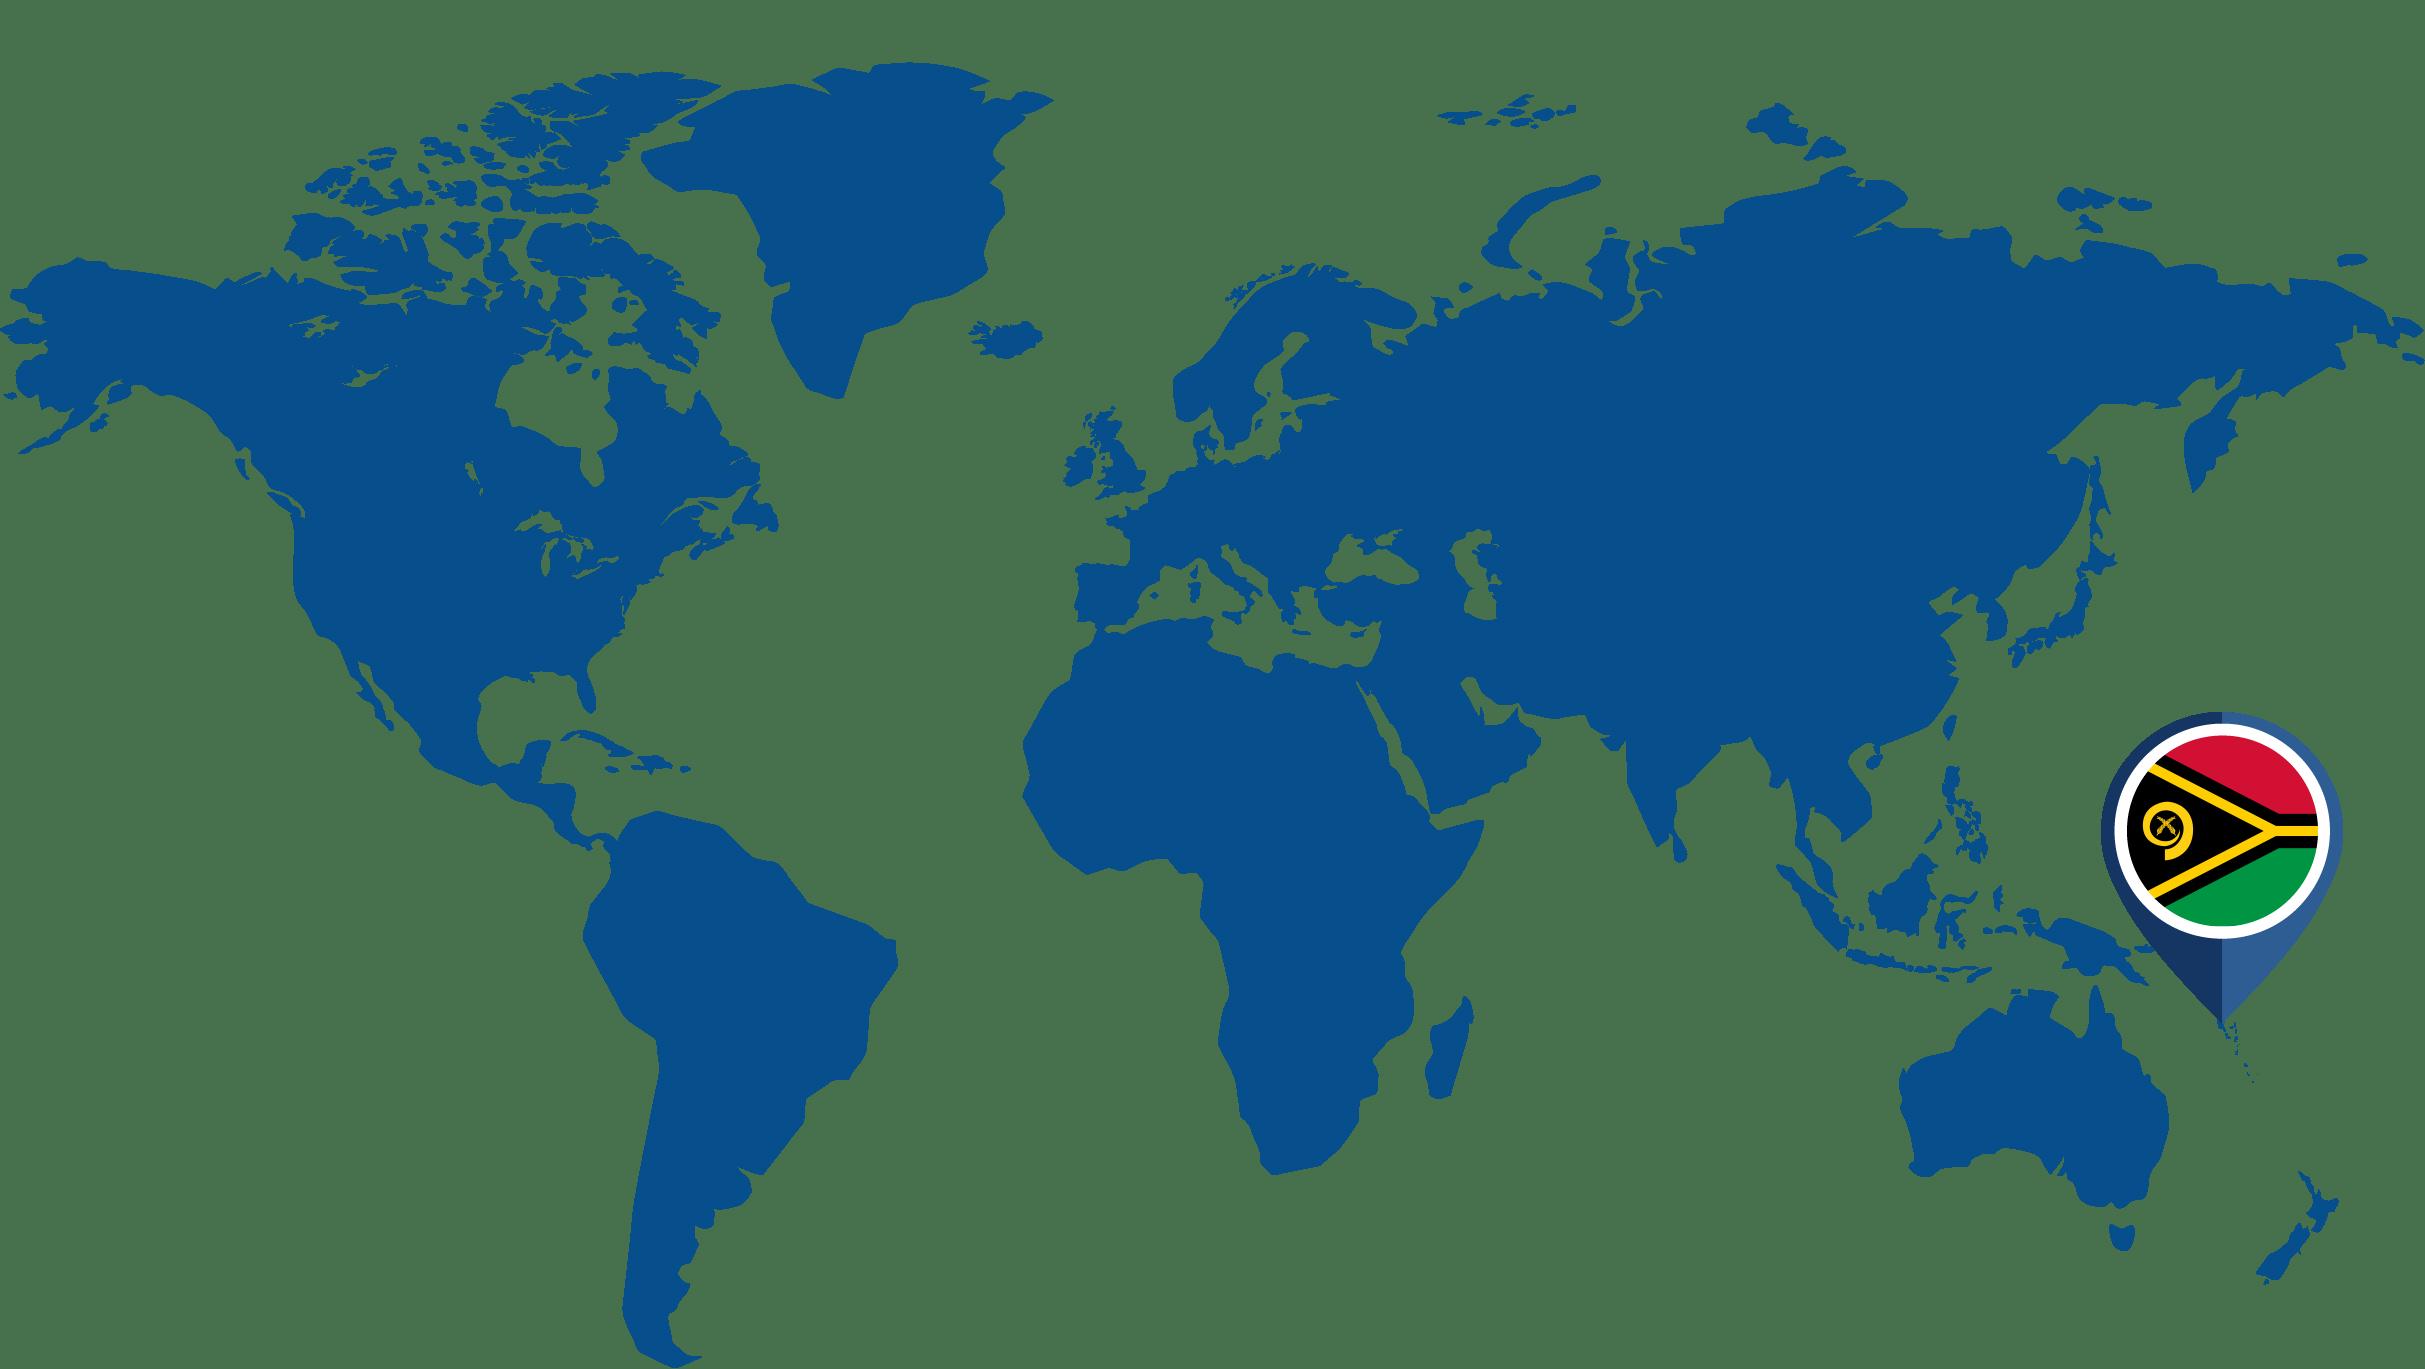 https://bluemina.com/wp-content/uploads/2020/02/vanuatu-map-01-1.png